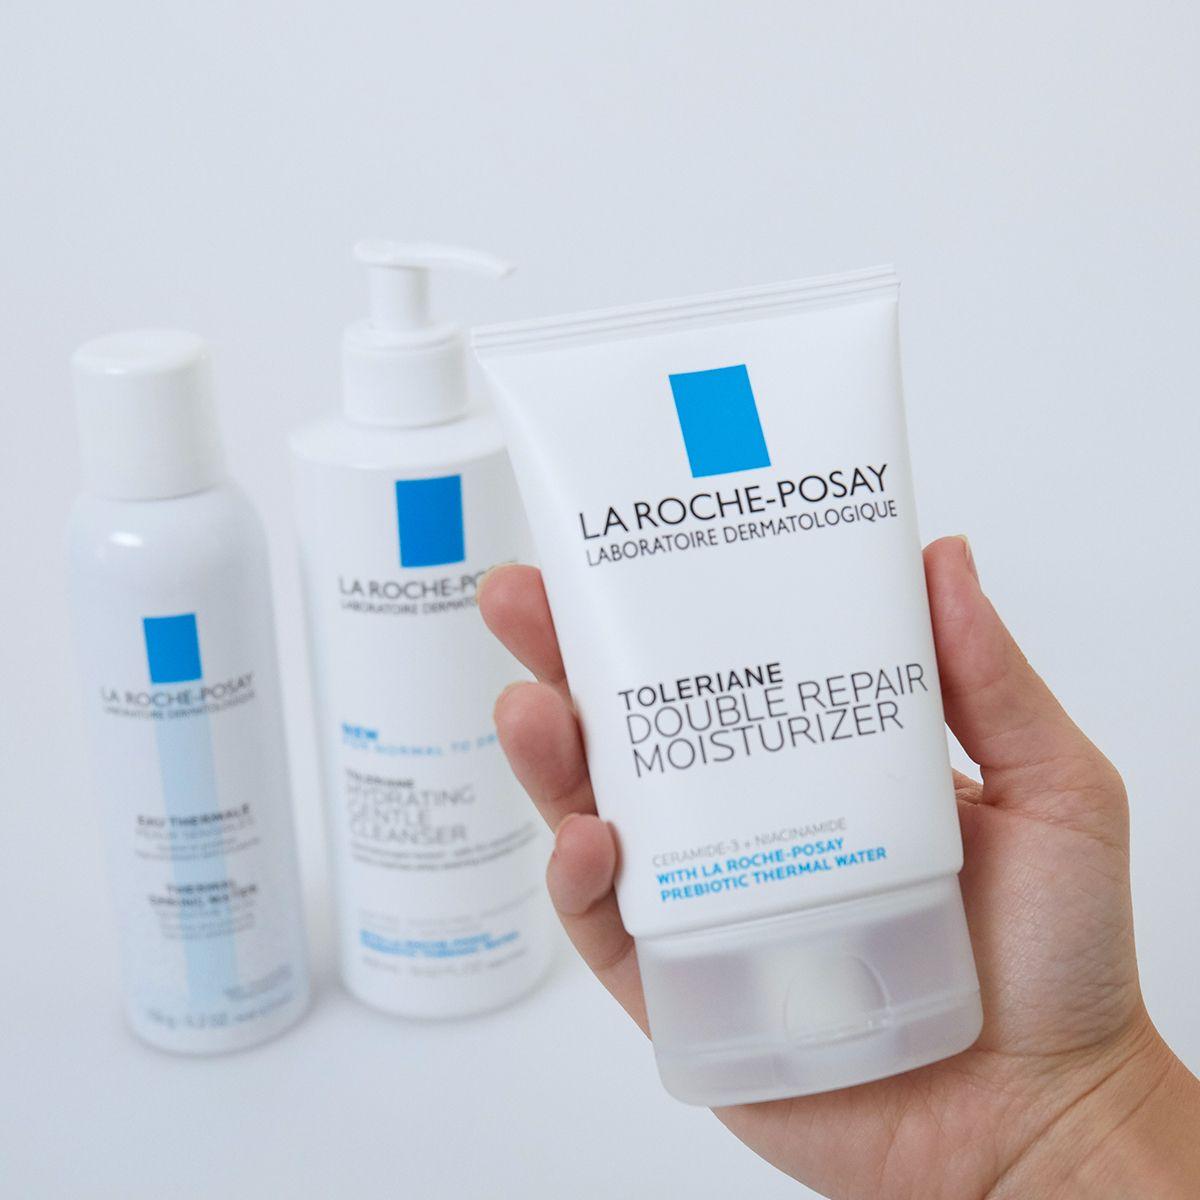 Toleriane Double Repair Face Moisturizer La Roche Posay Face Moisturizer Moisturizer For Sensitive Skin Moisturizer